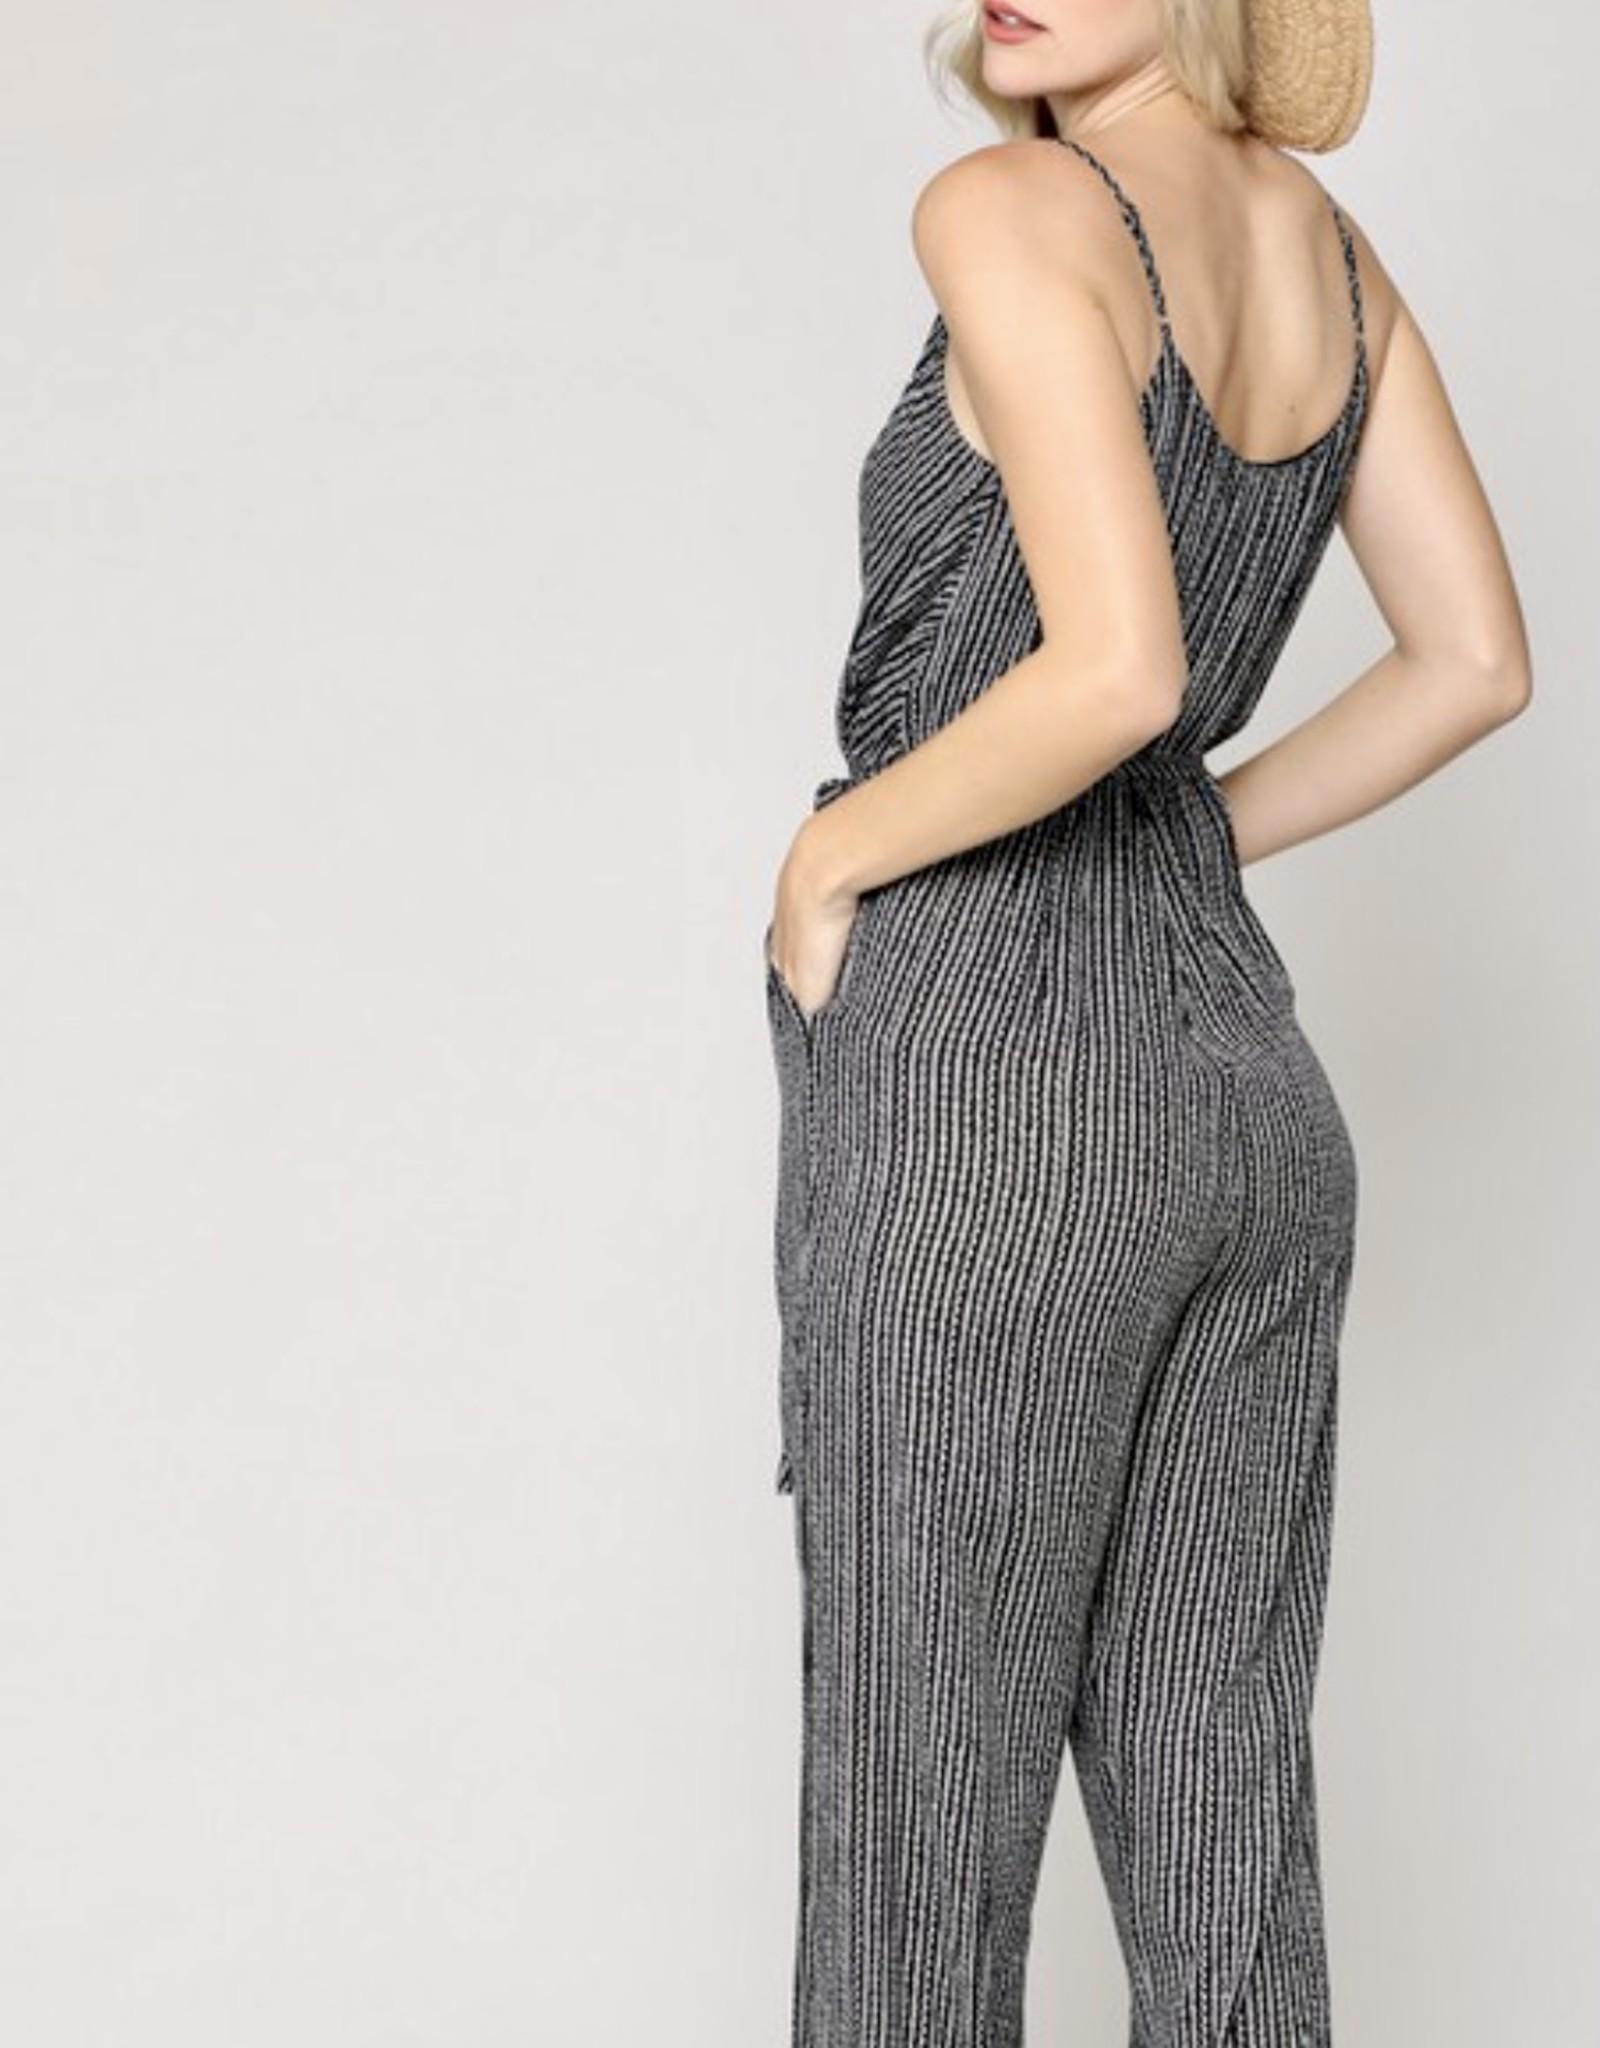 HUSH Deep v printed jumpsuit w/ open leg slit